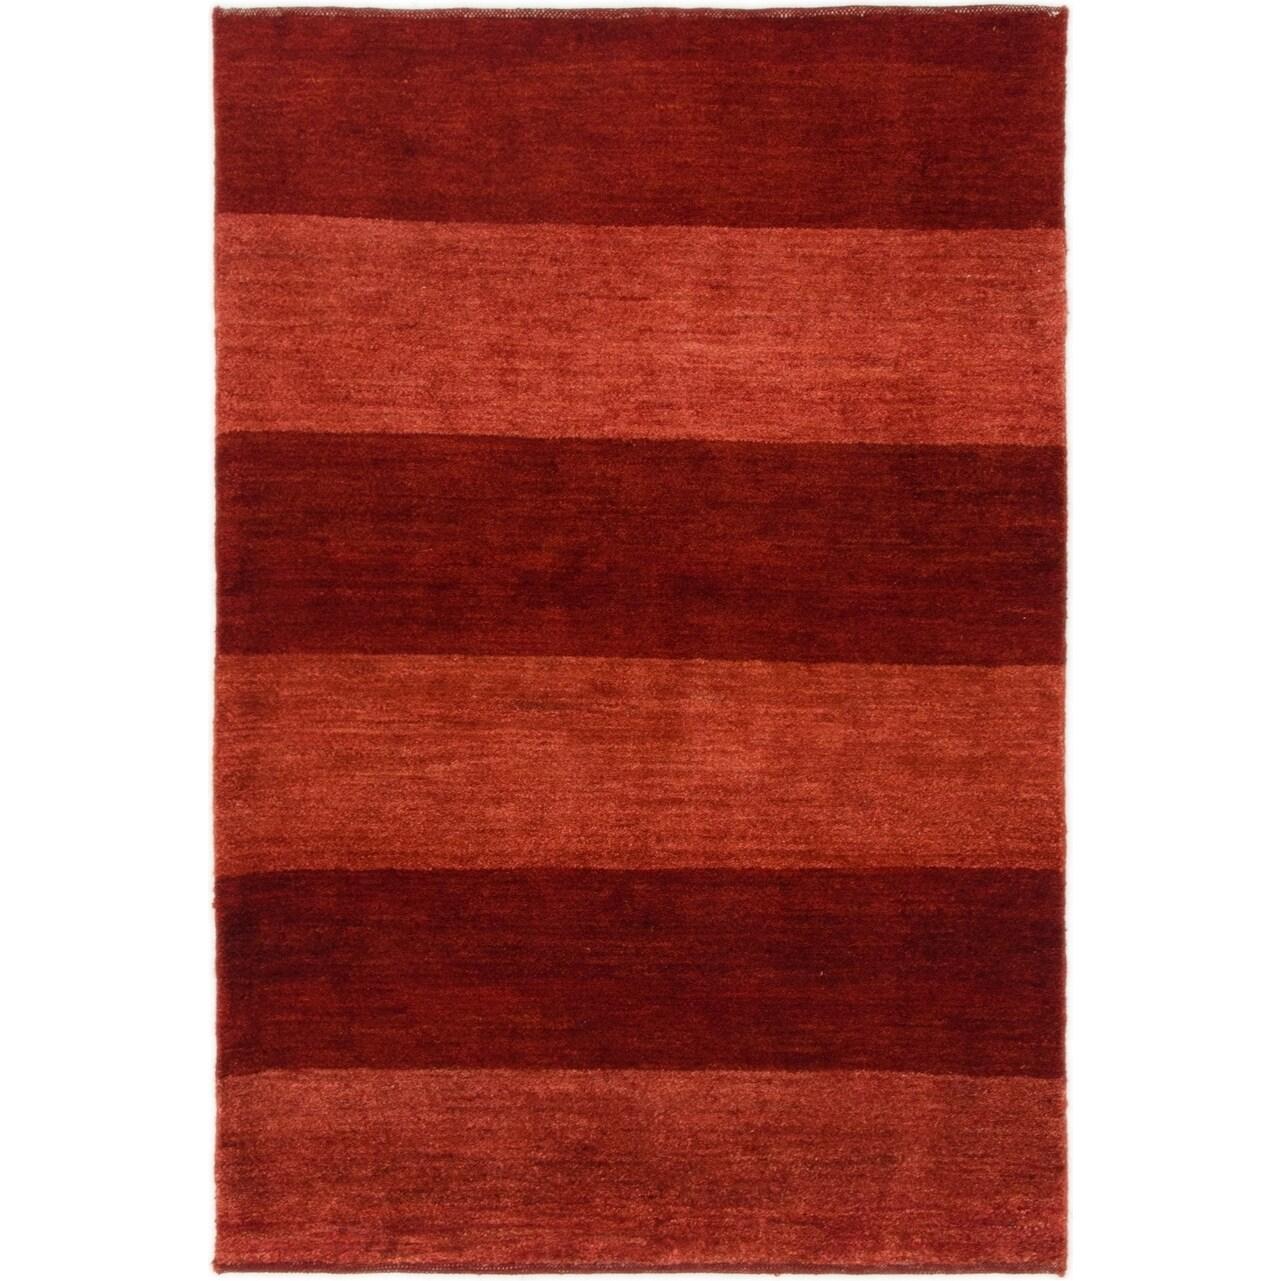 Hand Knotted Kashkuli Gabbeh Wool Area Rug - 3 3 x 4 10 (Burgundy - 3 3 x 4 10)